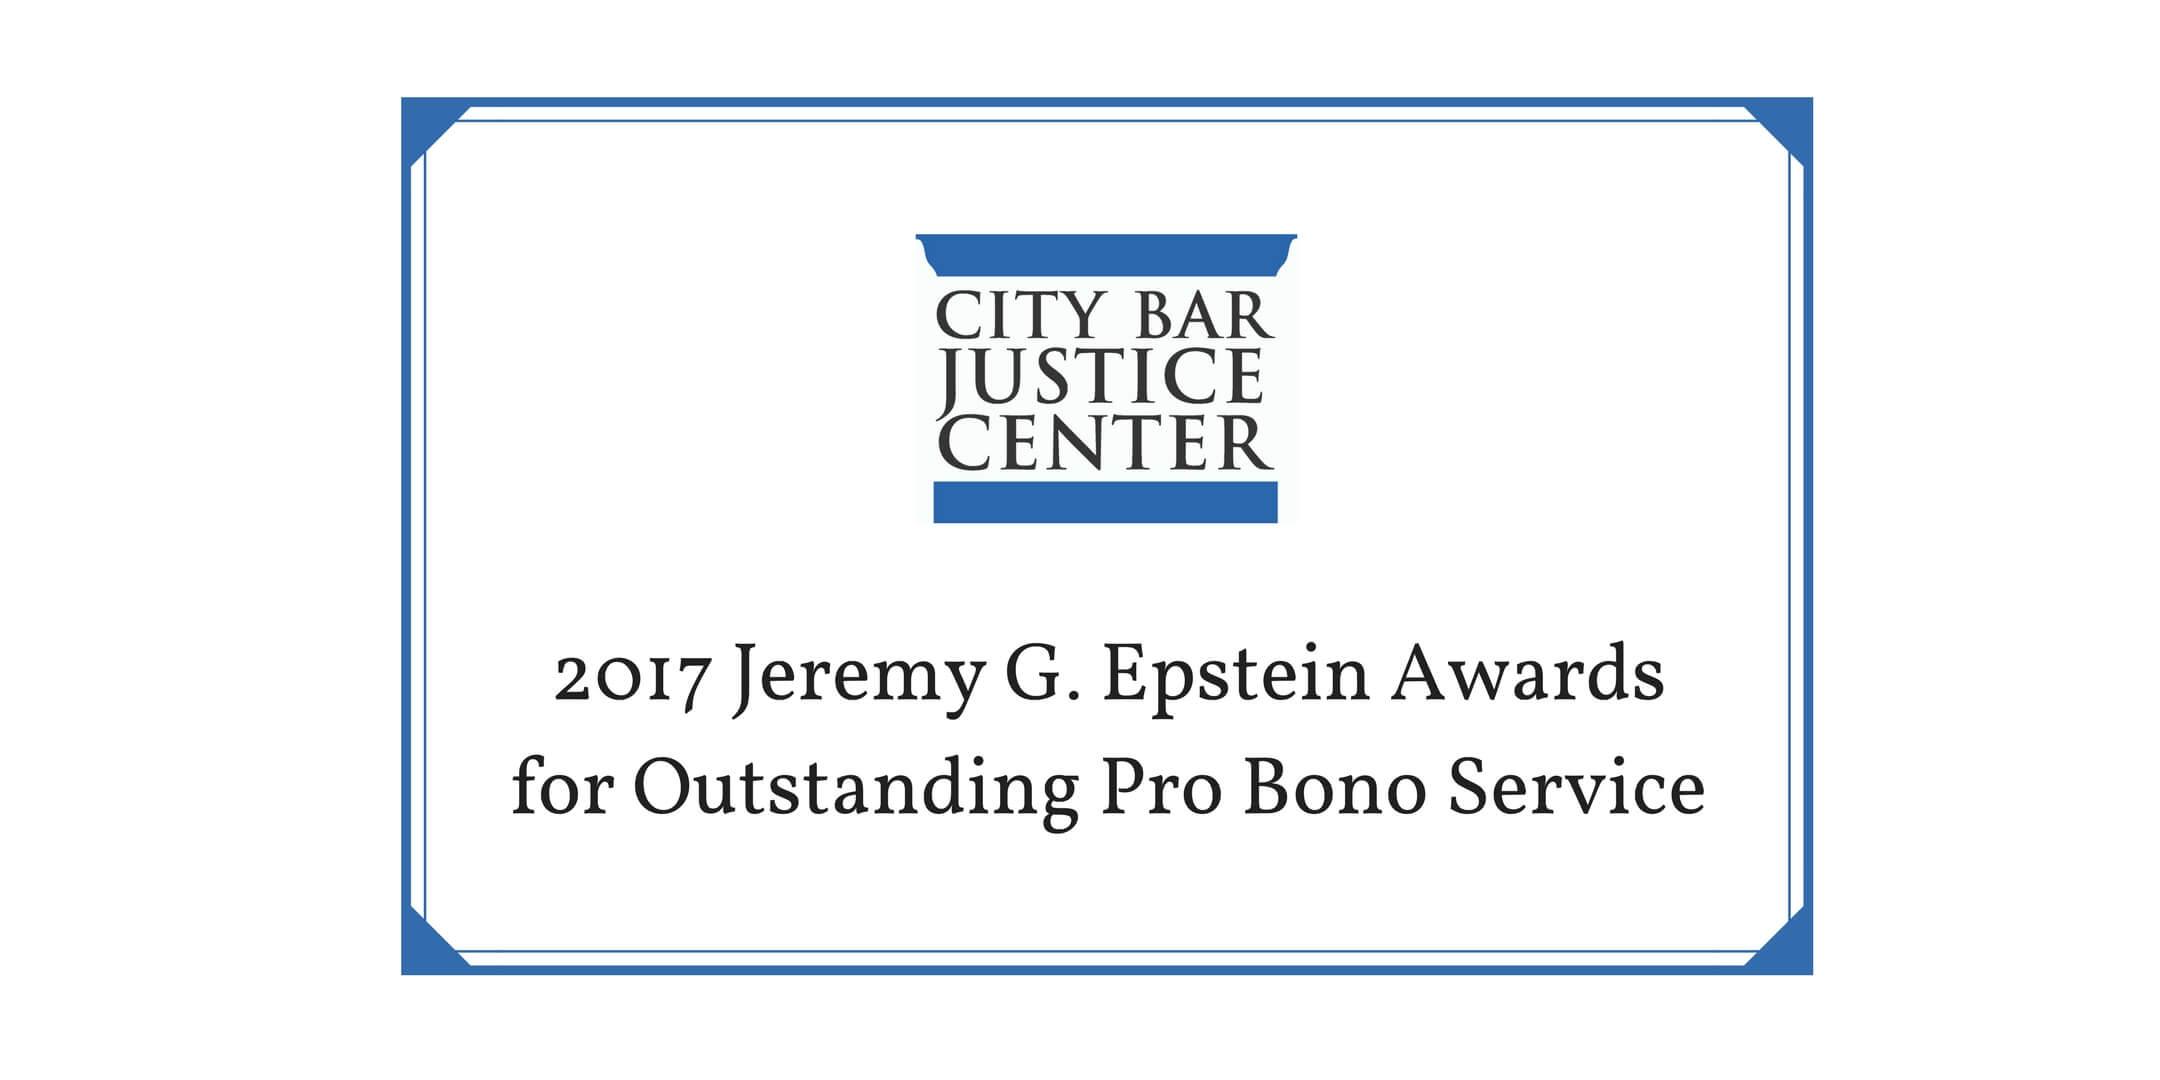 2017 Jeremy G. Epstein Awards